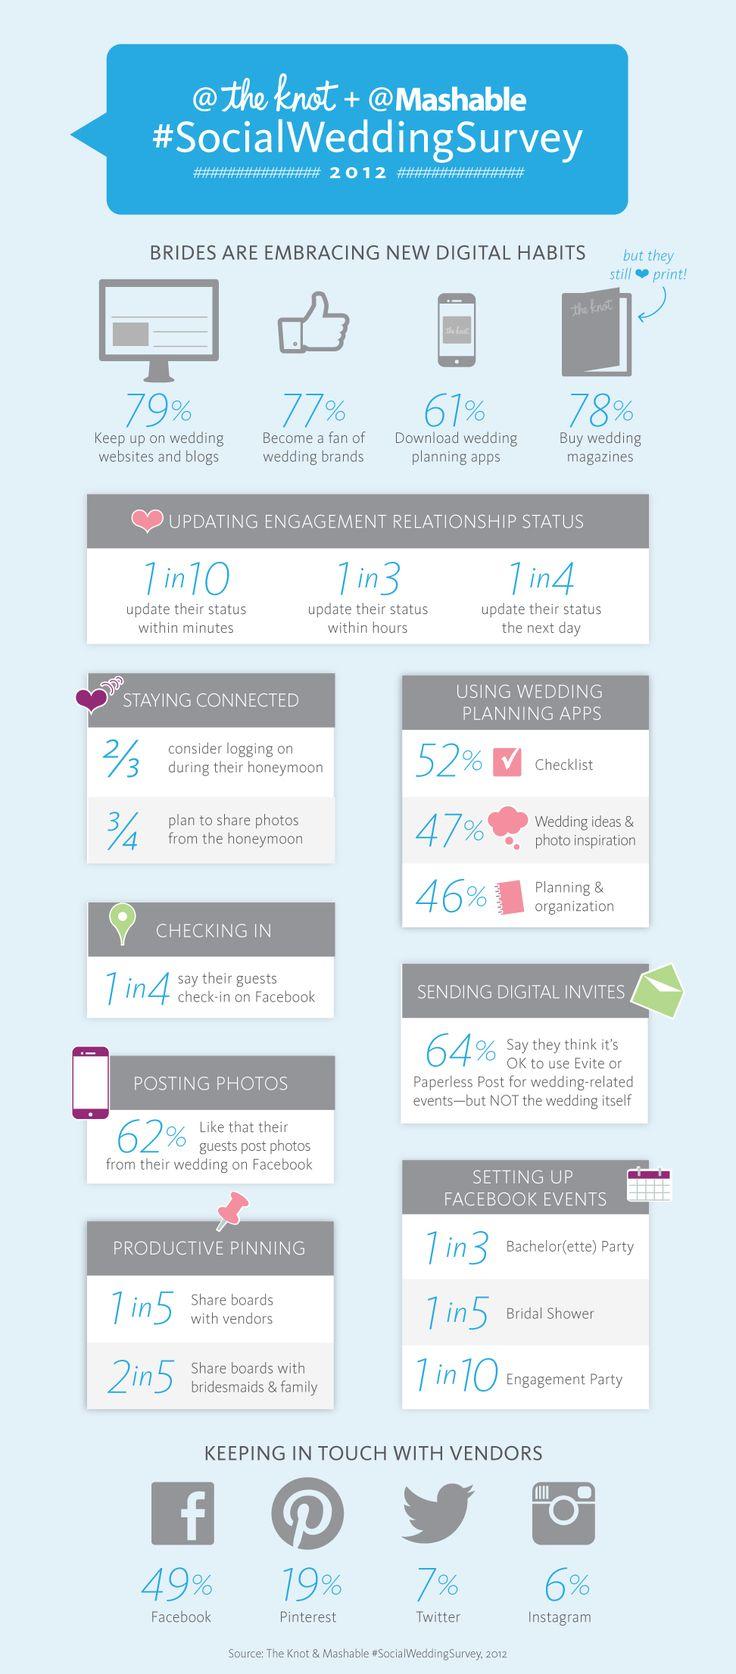 Facebook & Pinterest are the Wedding planners #SocialWeddingSurvey #infographic